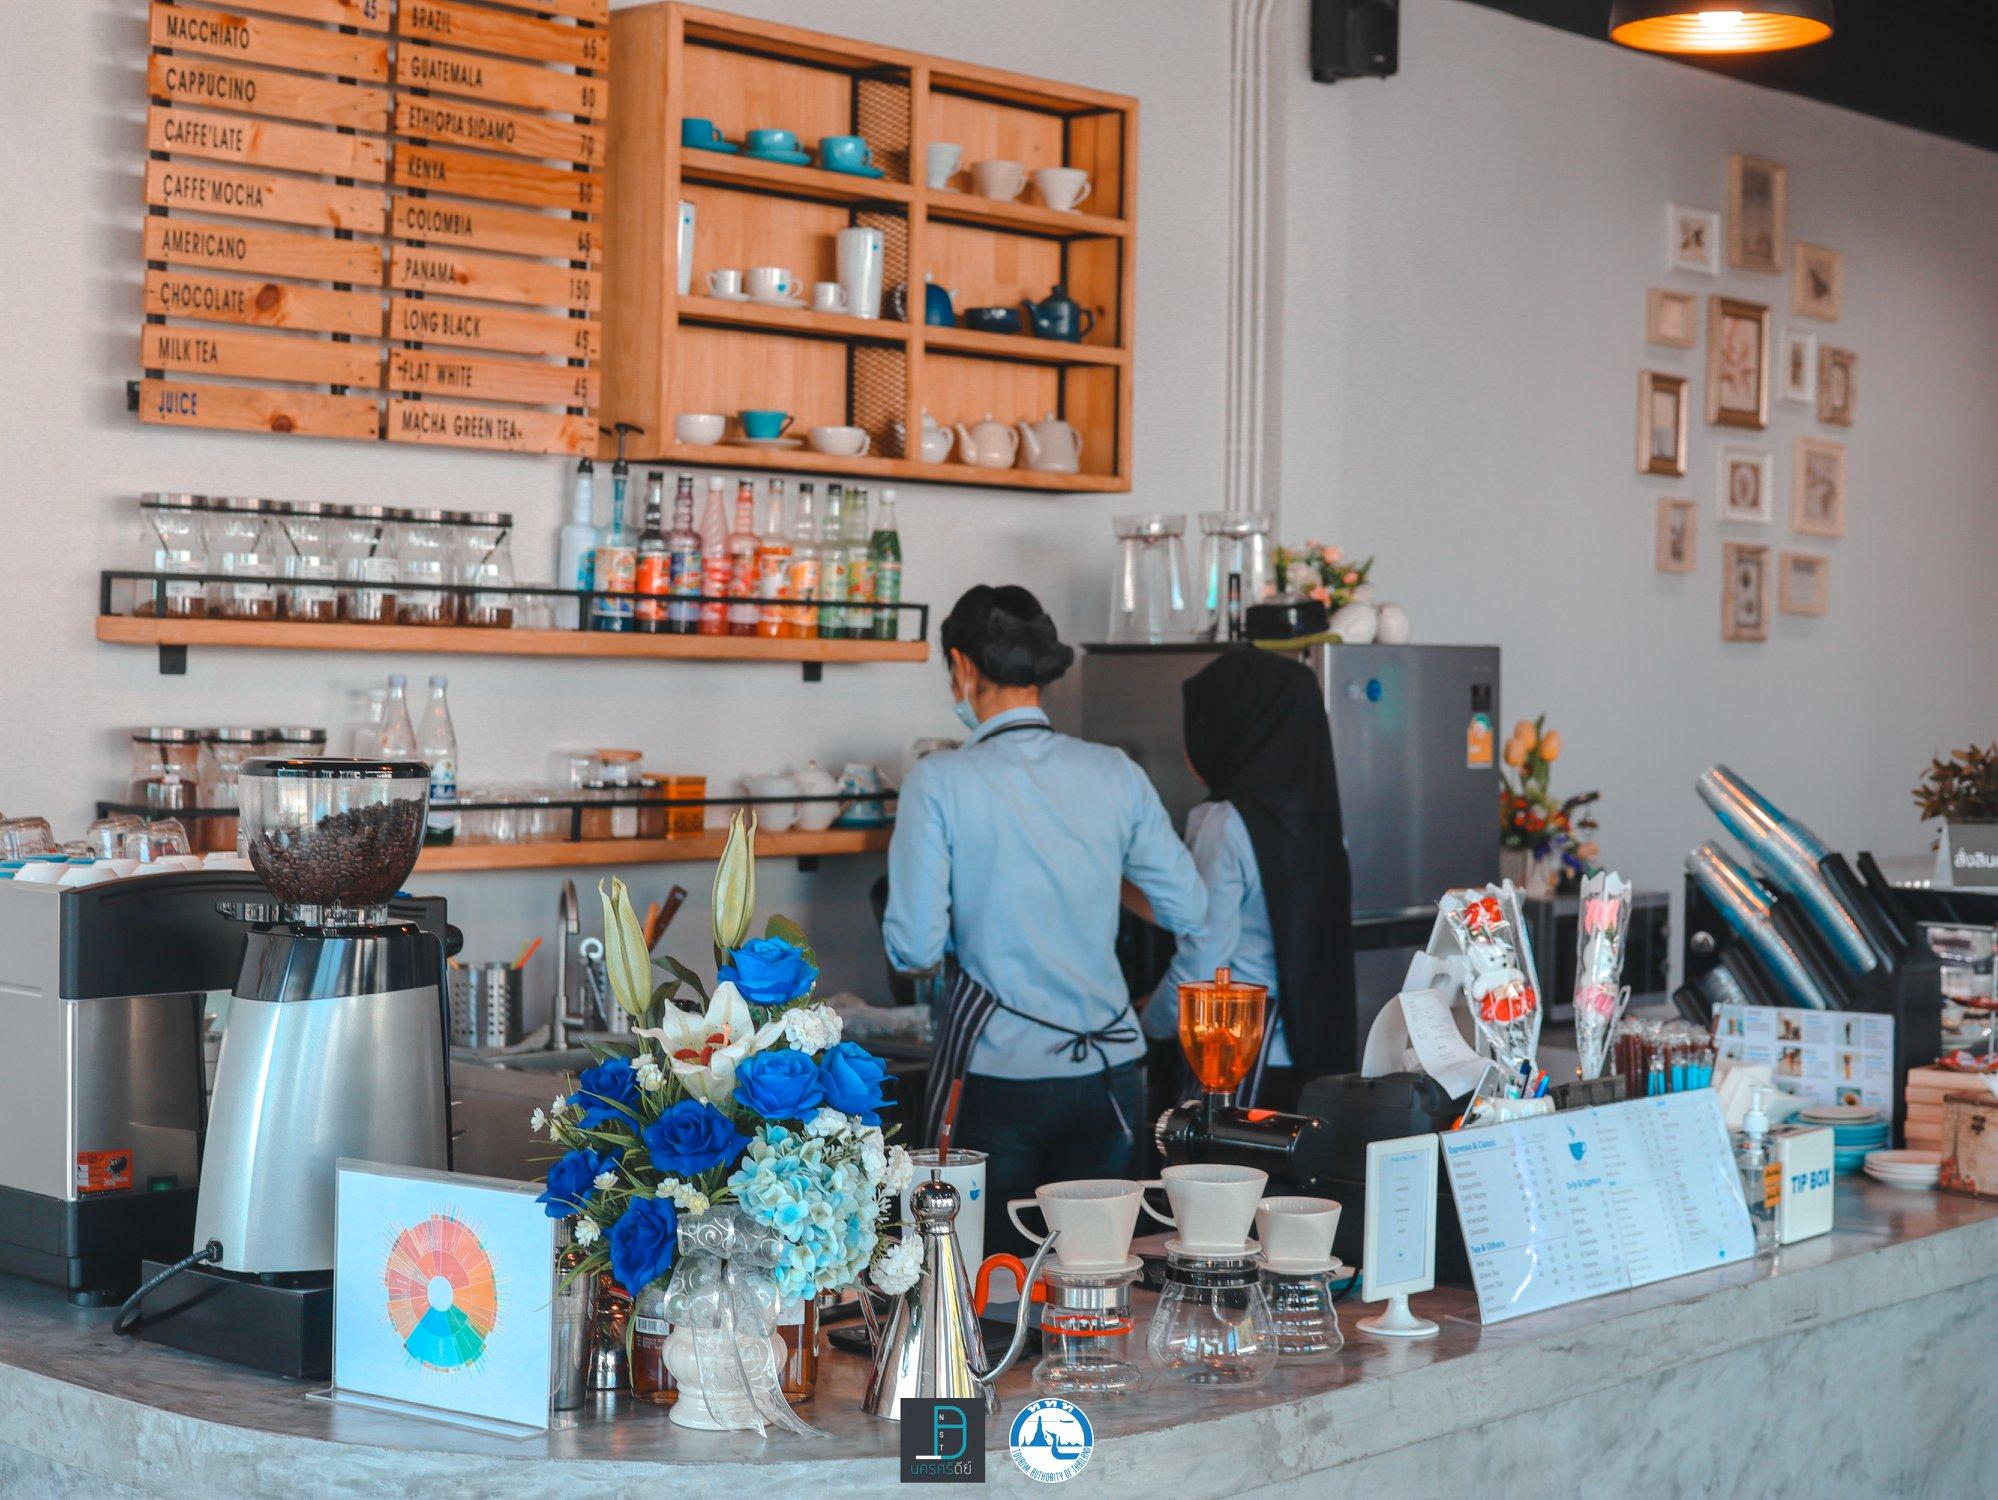 7.-Blue-Cup-Coffee-คาเฟ่โทนสีฟ้าปนขาว-สไตล์มินิมอล-บรรยากาศร้านสบายๆ-เหมาะสำหรับนั่งชิว-อ่านหนังสือนั่งเล่นได้ยาวๆกันเลยทีเดียว คาเฟ่,สตูล,เด็ด,จุดเช็คอิน,อร่อย,ร้านอาหาร,จุดถ่ายรูป,สถานที่ท่องเที่ยว